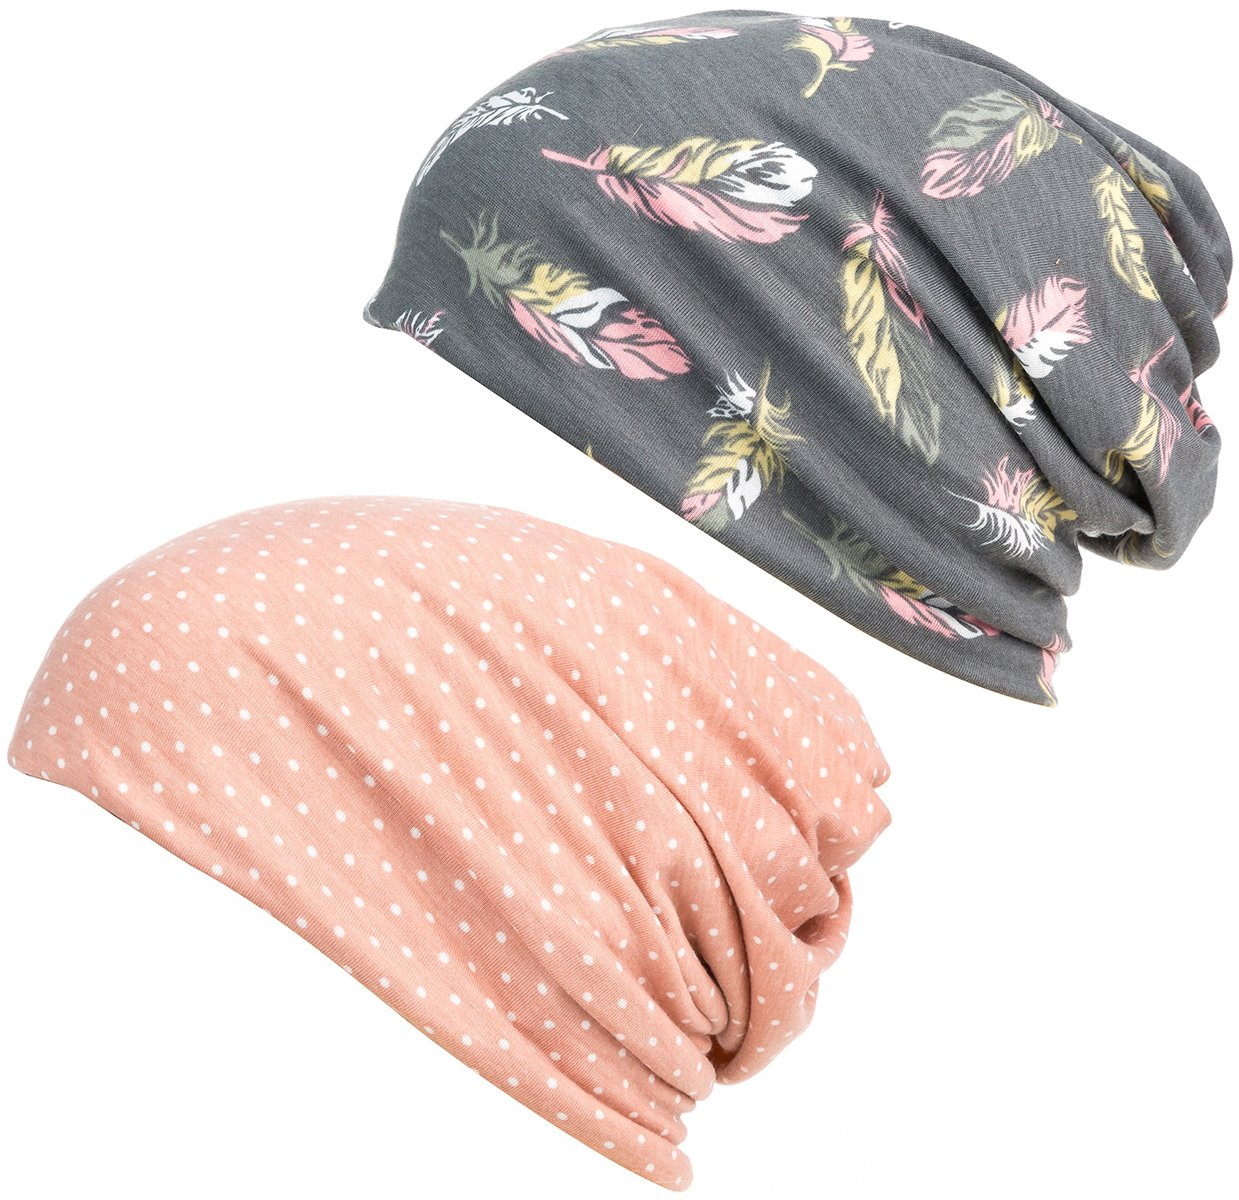 DancMolly Print Flower Head Cap Cancer Hats Beanie Stretch Casual Turbans for Women (Pink+Gray)